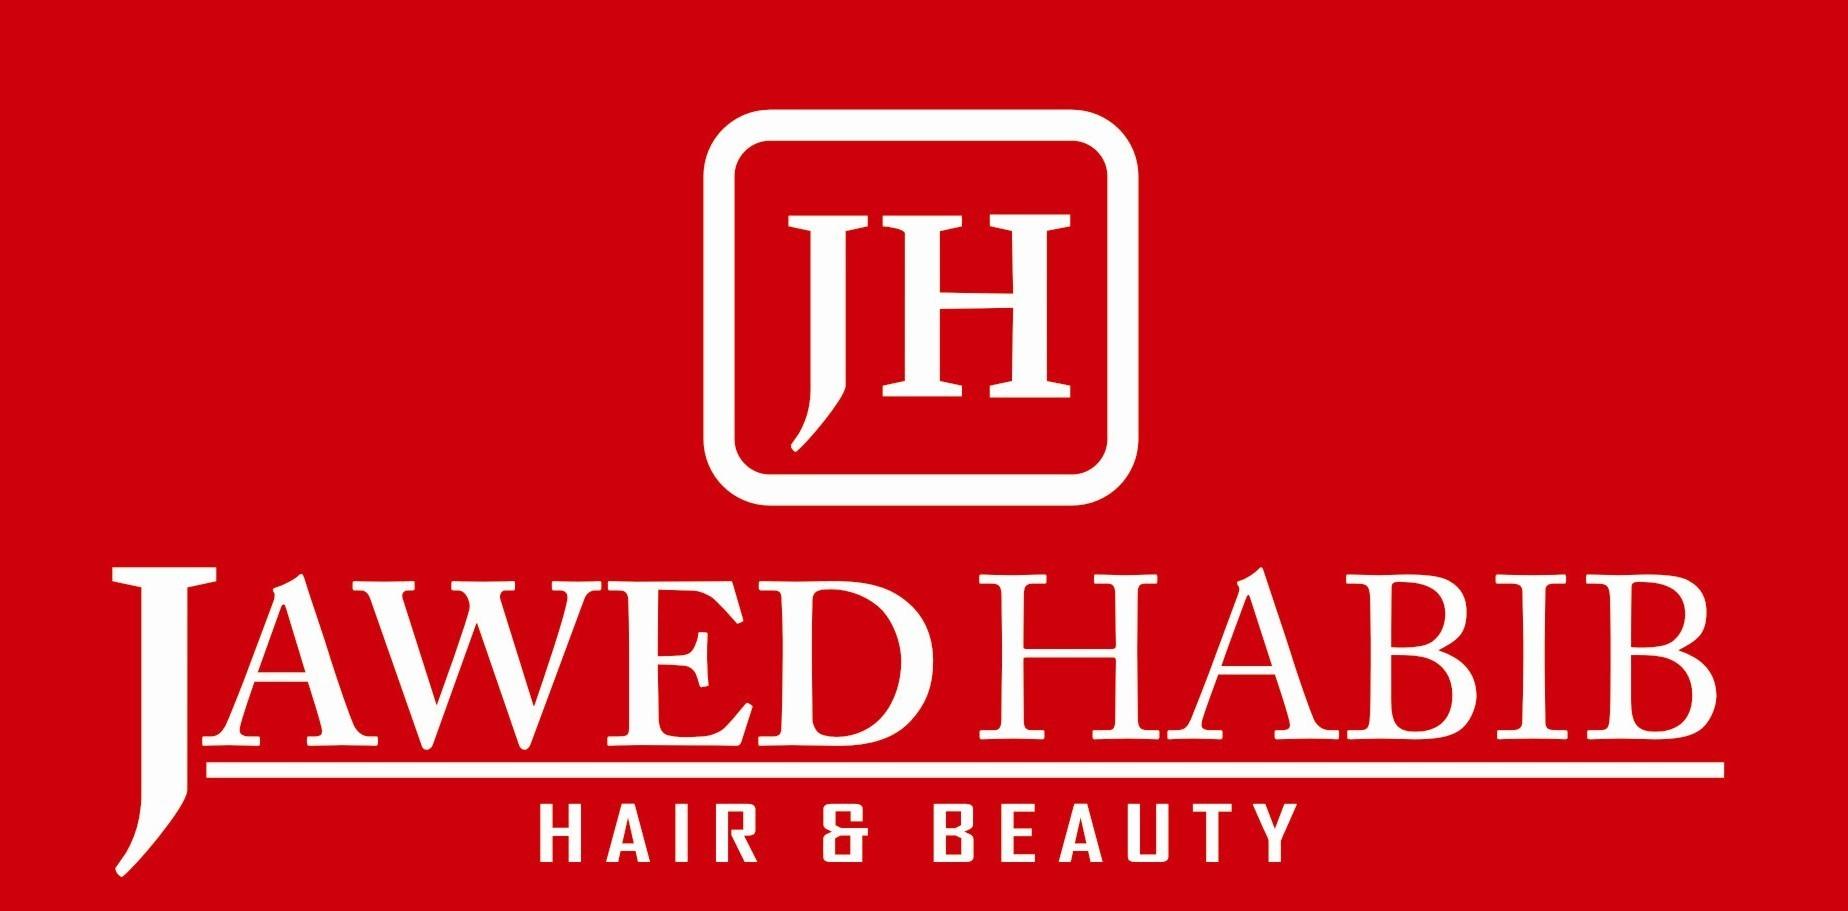 Jawed Habib Hair & Beauty Salons - Chetpet - Chennai Image